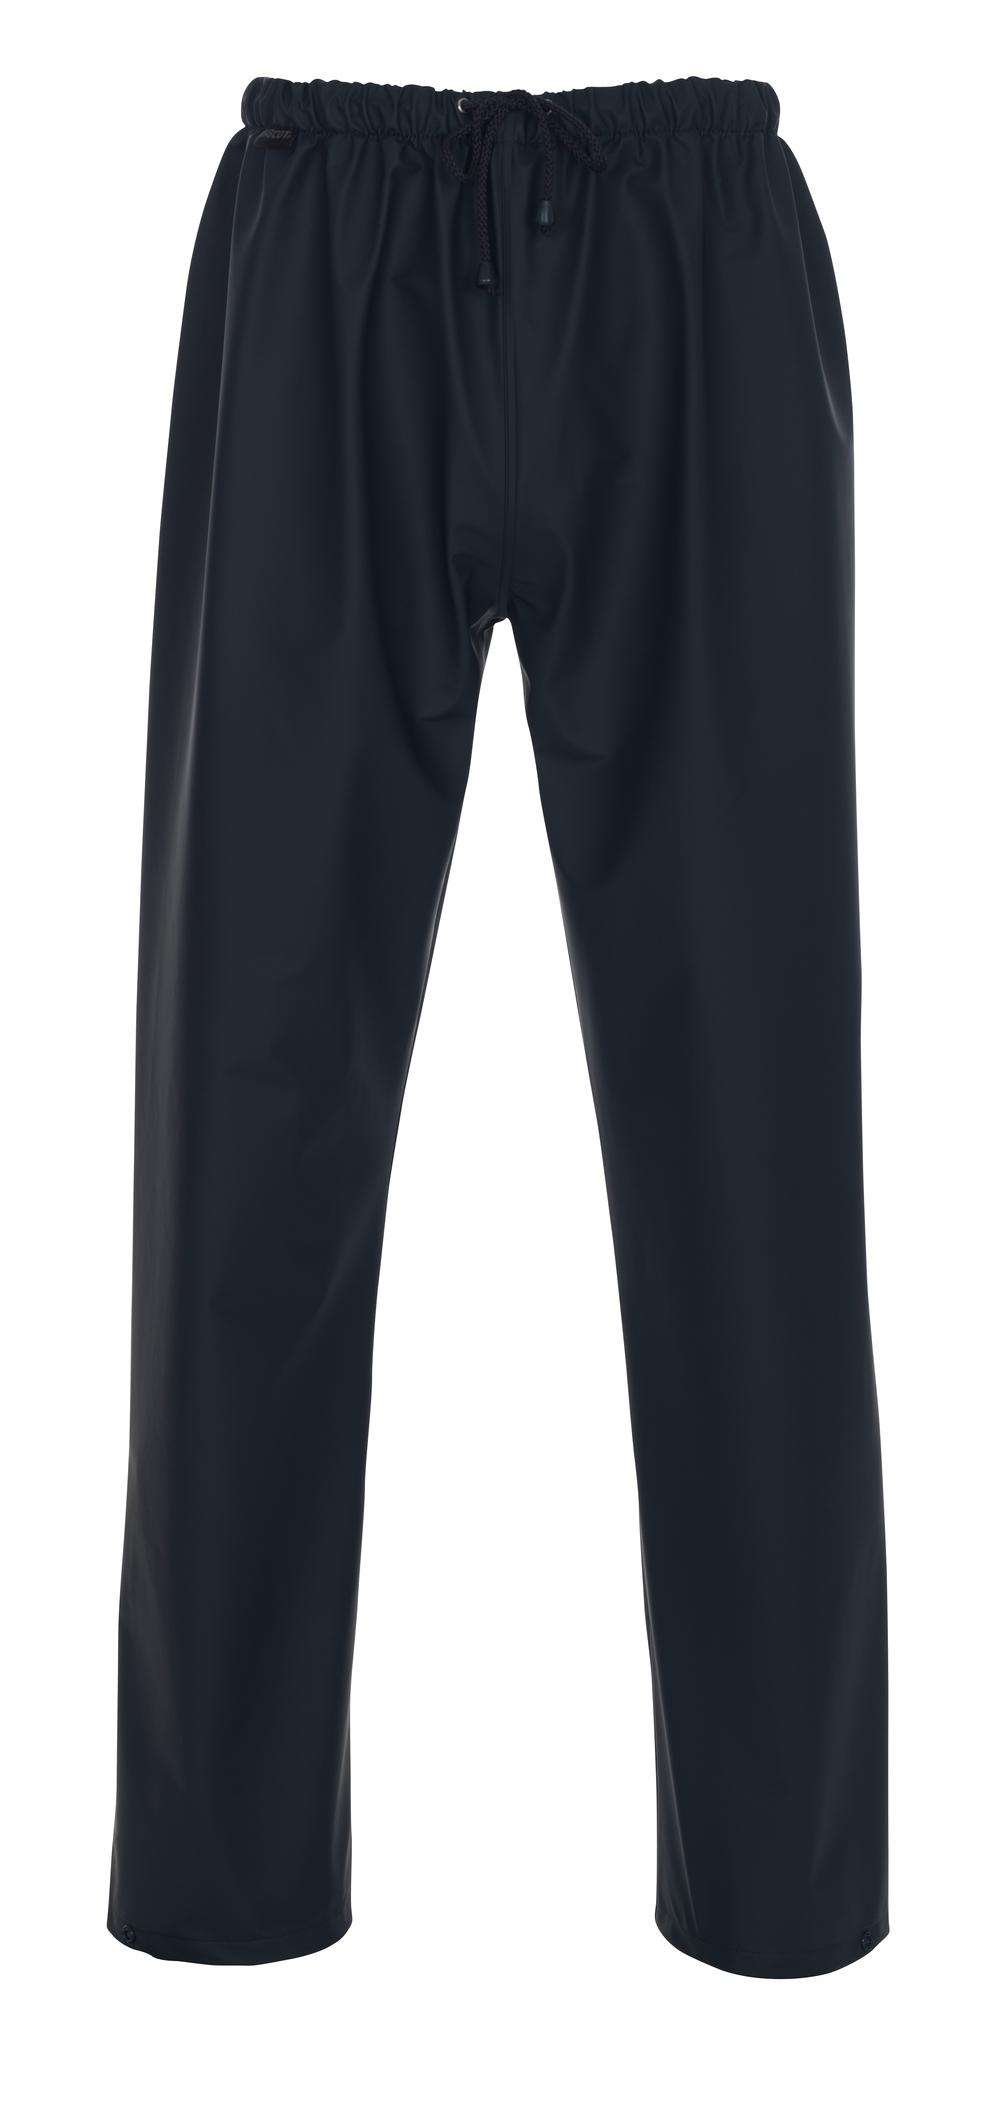 07062-028-01 Rain Trousers - navy